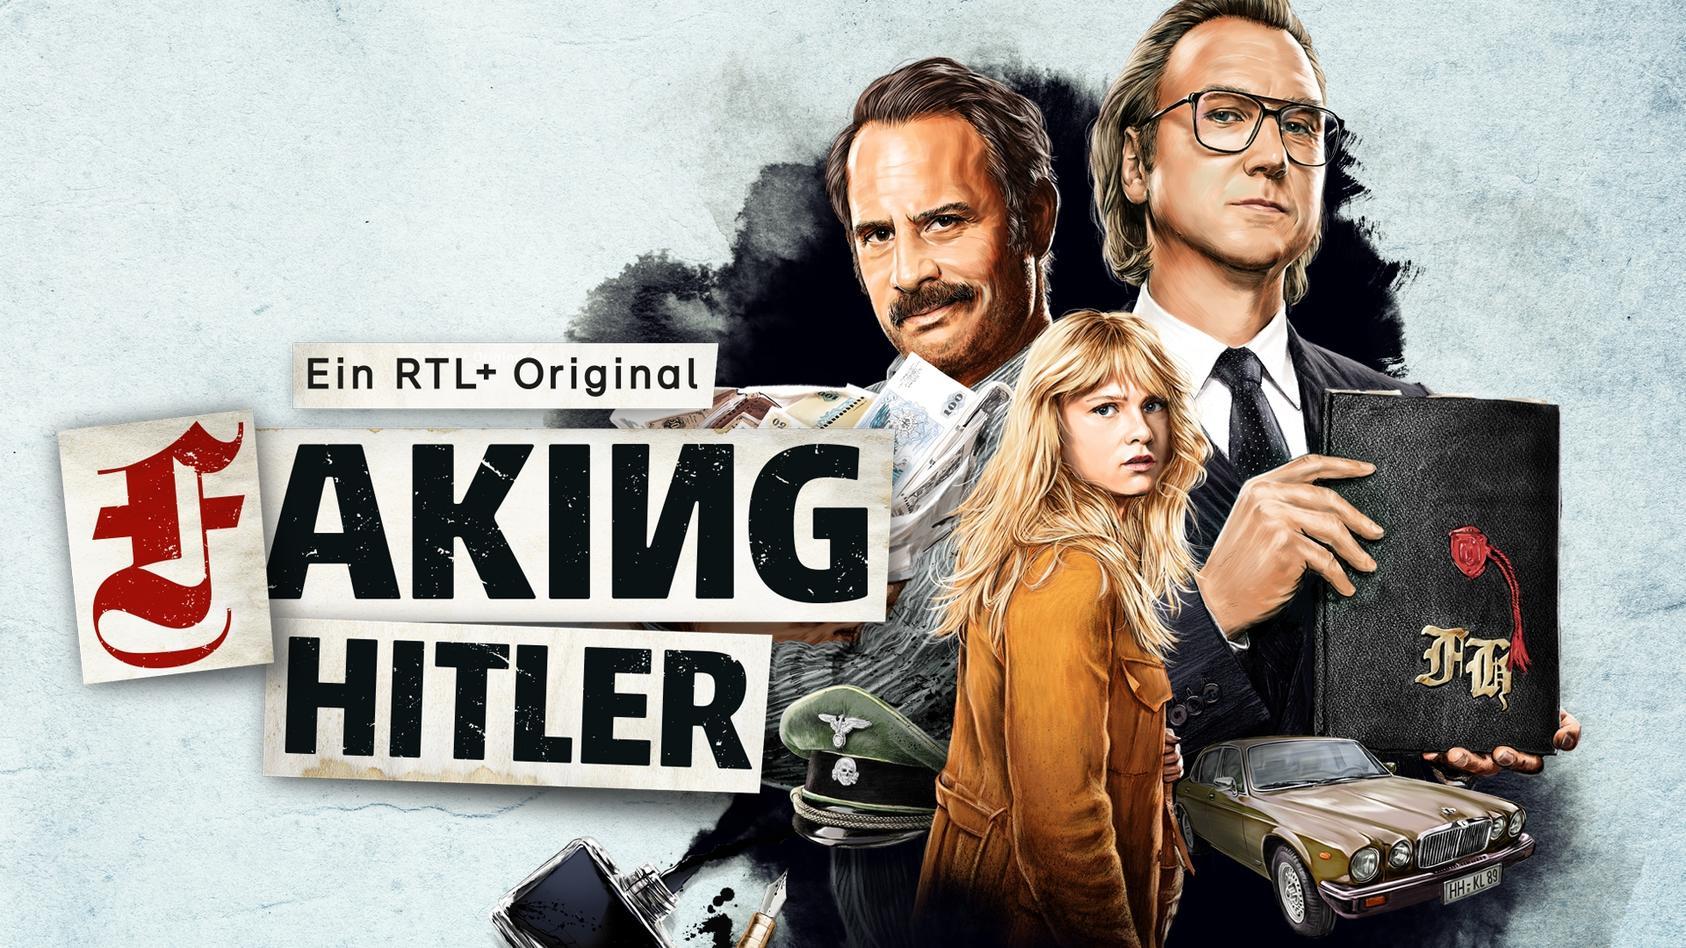 faking-hitler-mit-moritz-bleibtreu-lars-eidinger-und-sinje-irslinger